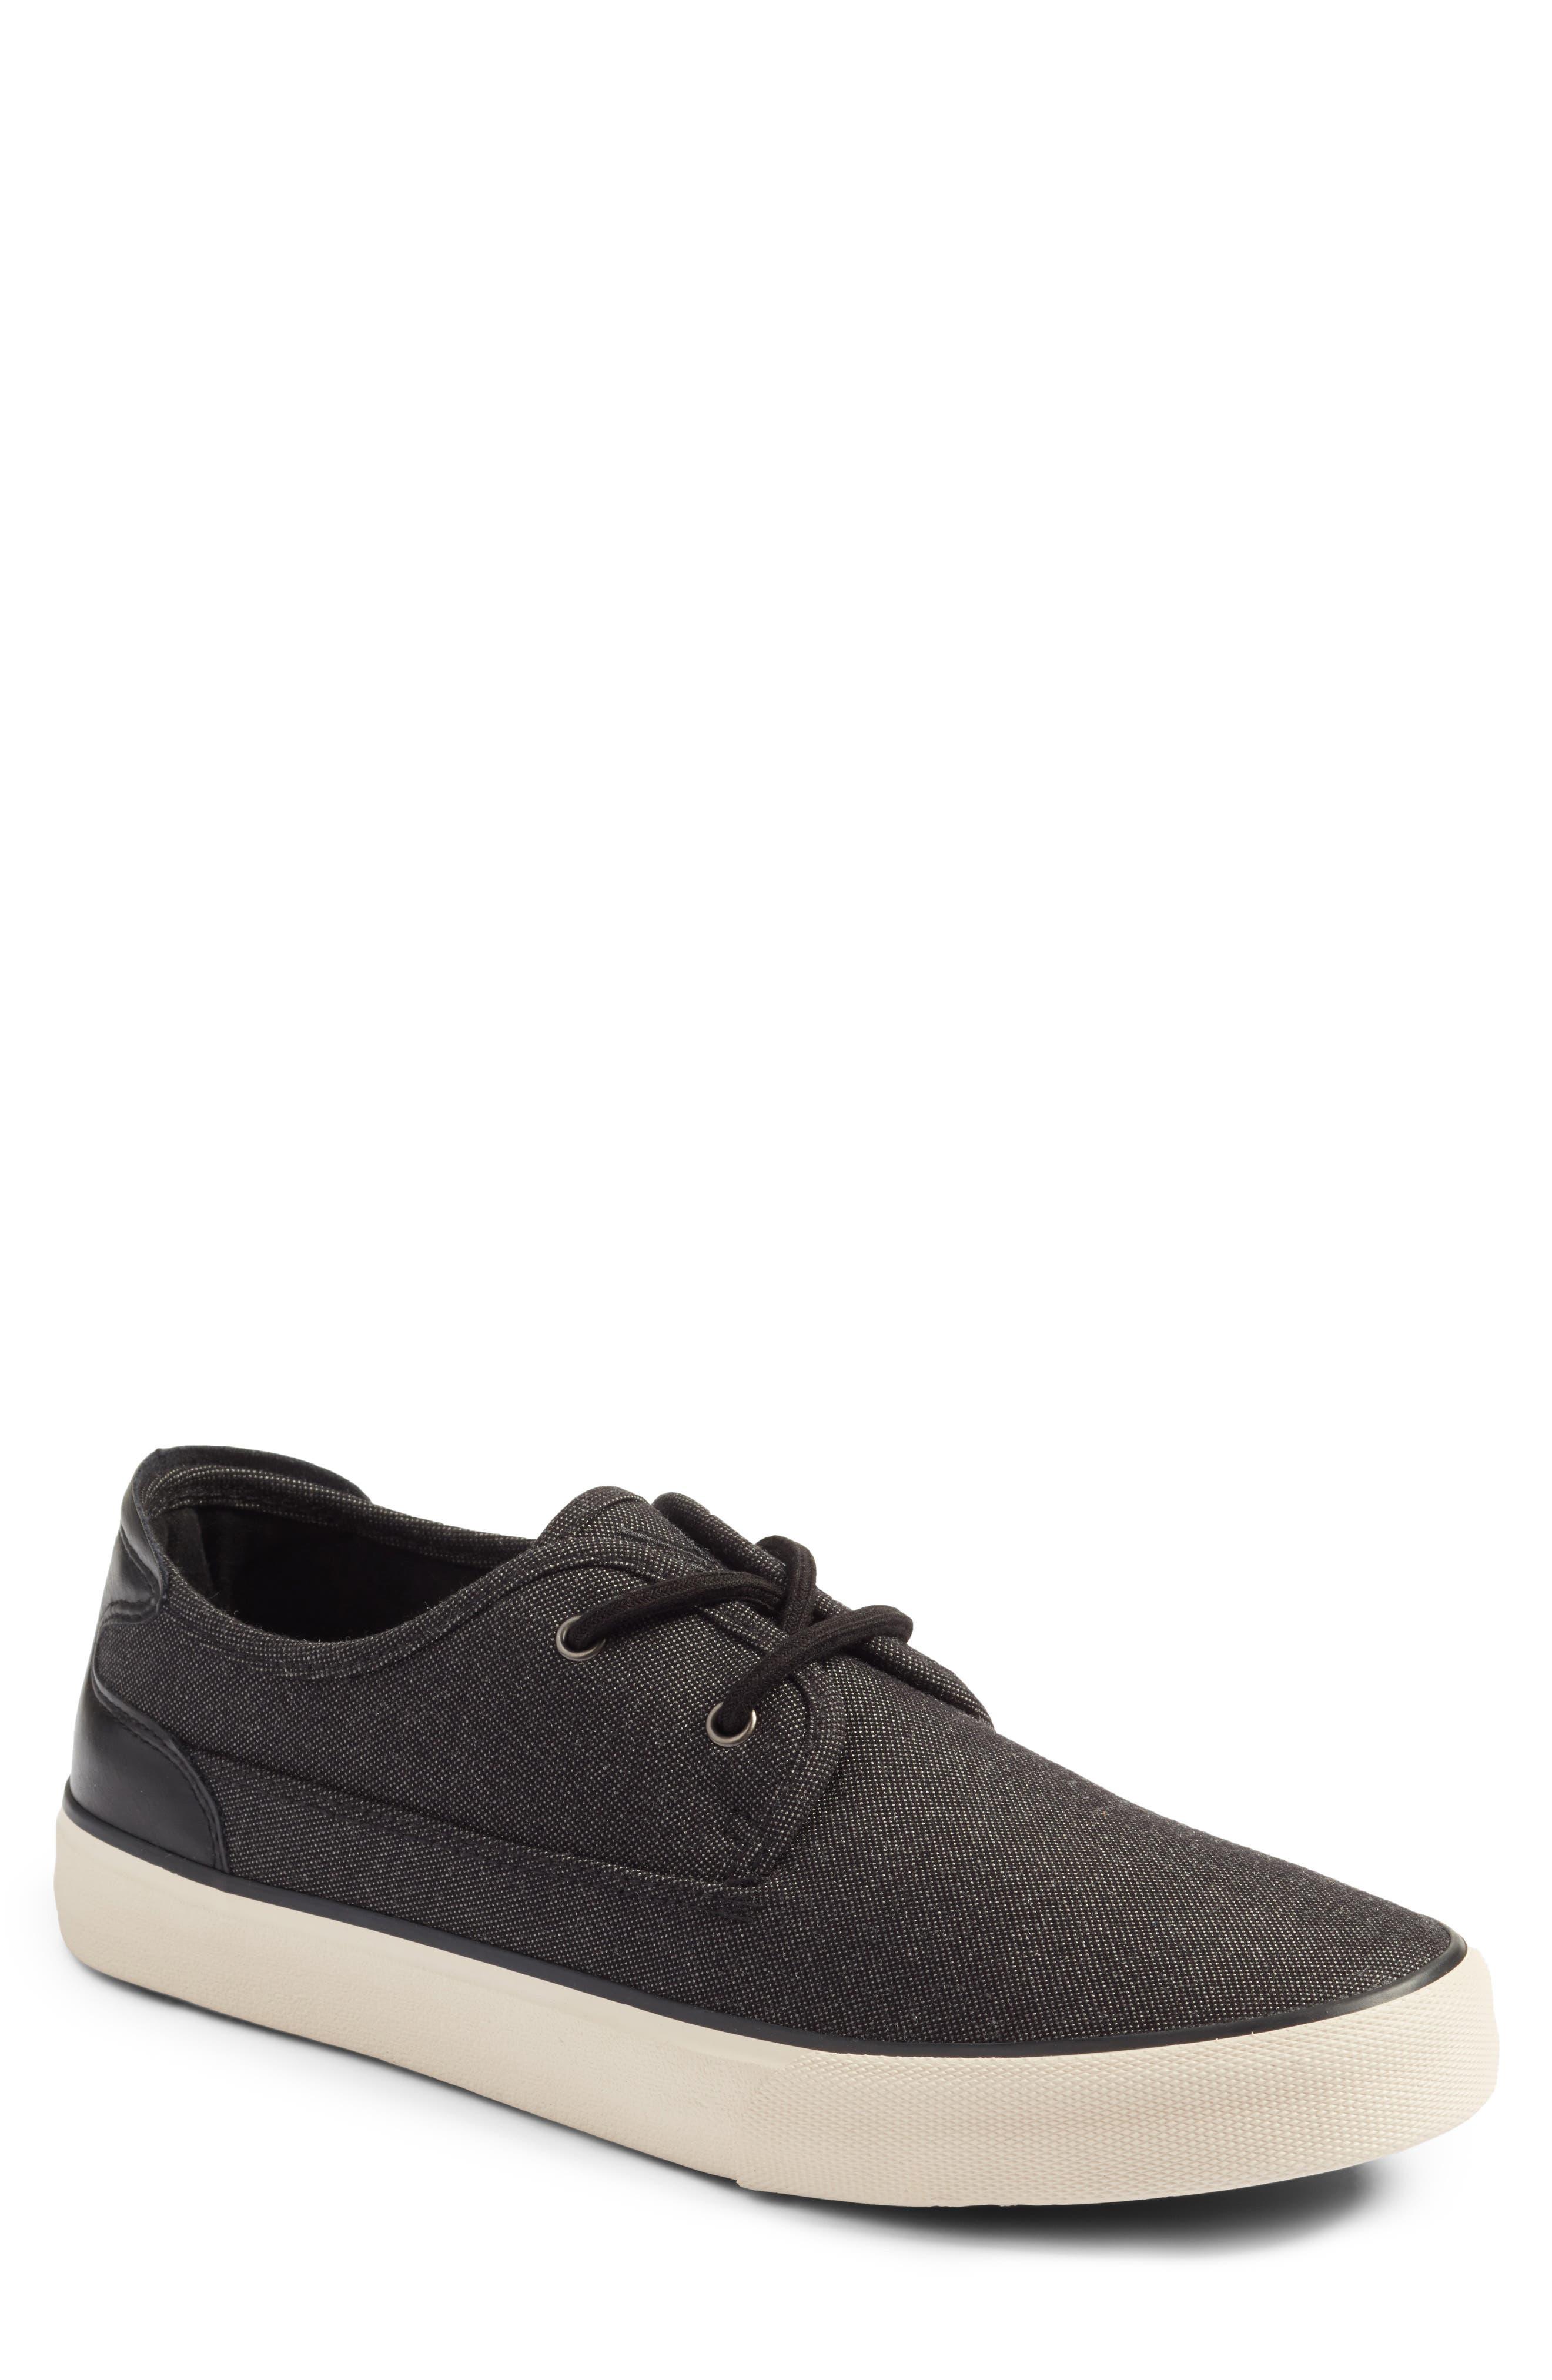 Morris Sneaker,                             Main thumbnail 1, color,                             Black/ Bone